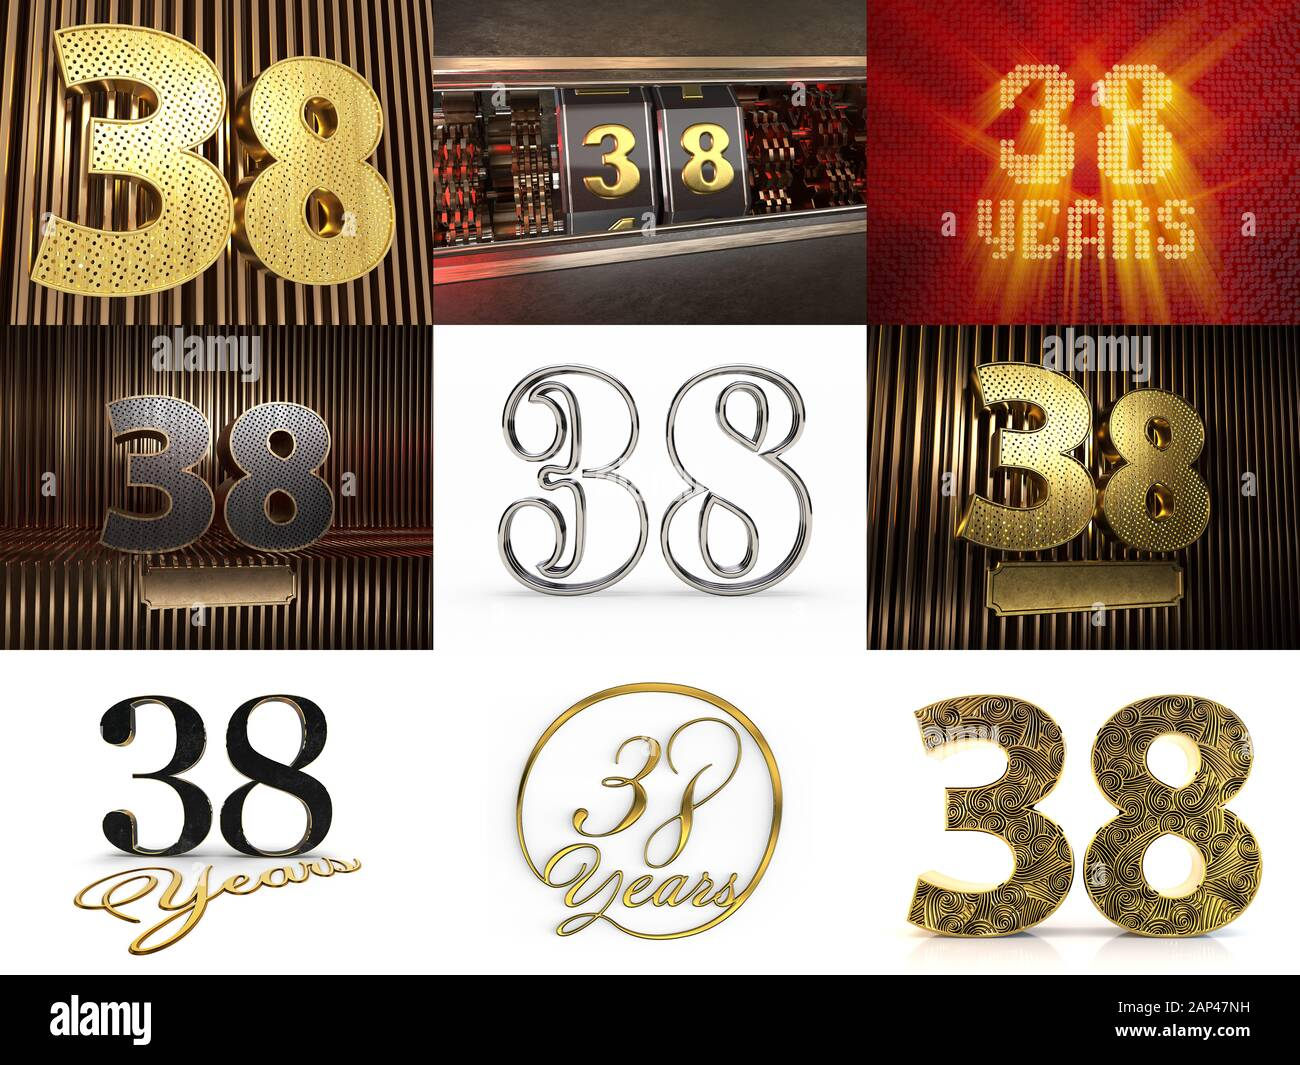 Number 38 Sign Immagini e Fotos Stock - Alamy